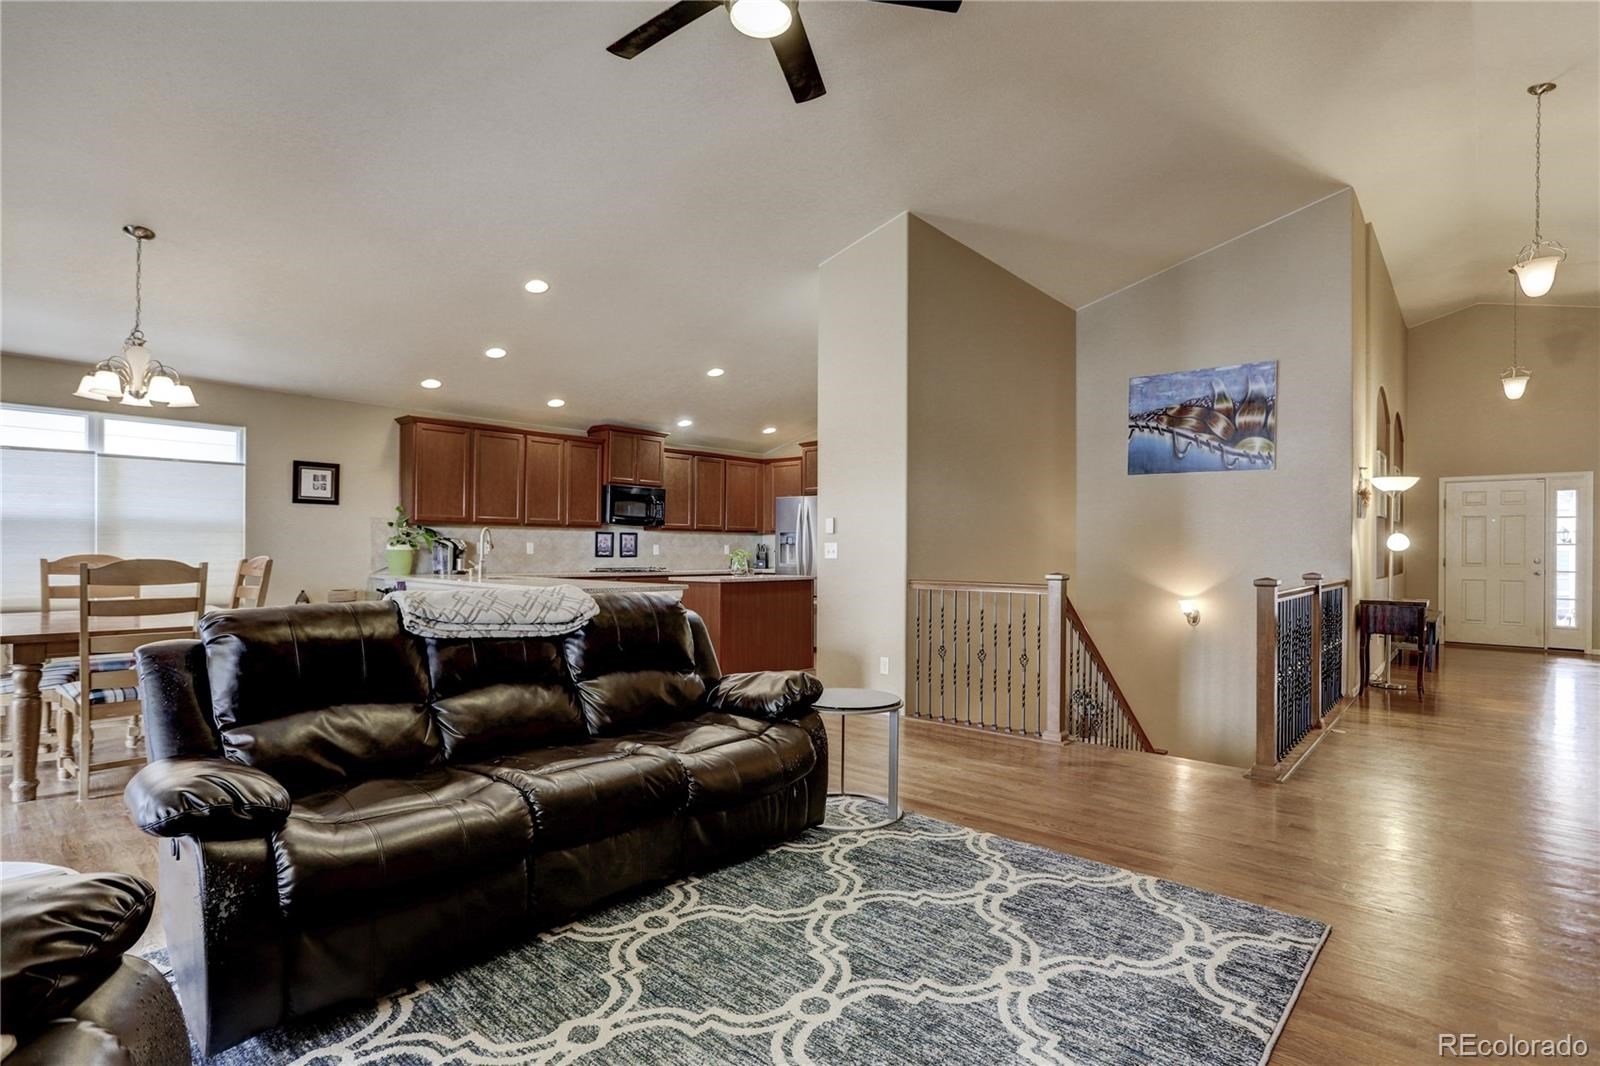 MLS# 8122893 - 10 - 2905 Saratoga Trail, Frederick, CO 80516